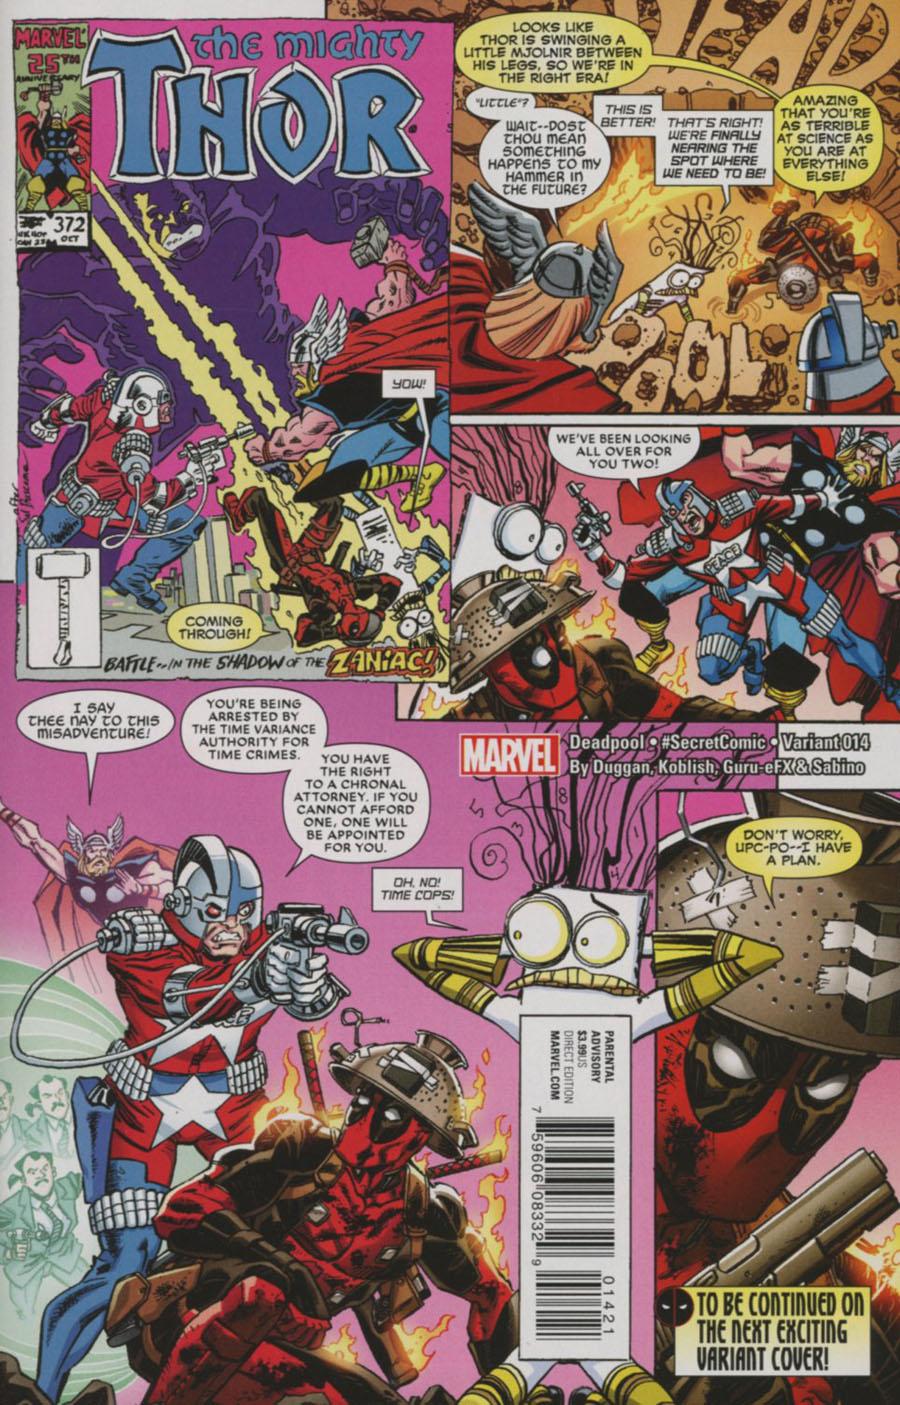 Deadpool Vol 5 #14 Cover B Variant Scott Koblish Secret Comic Cover (Civil War II Tie-In)